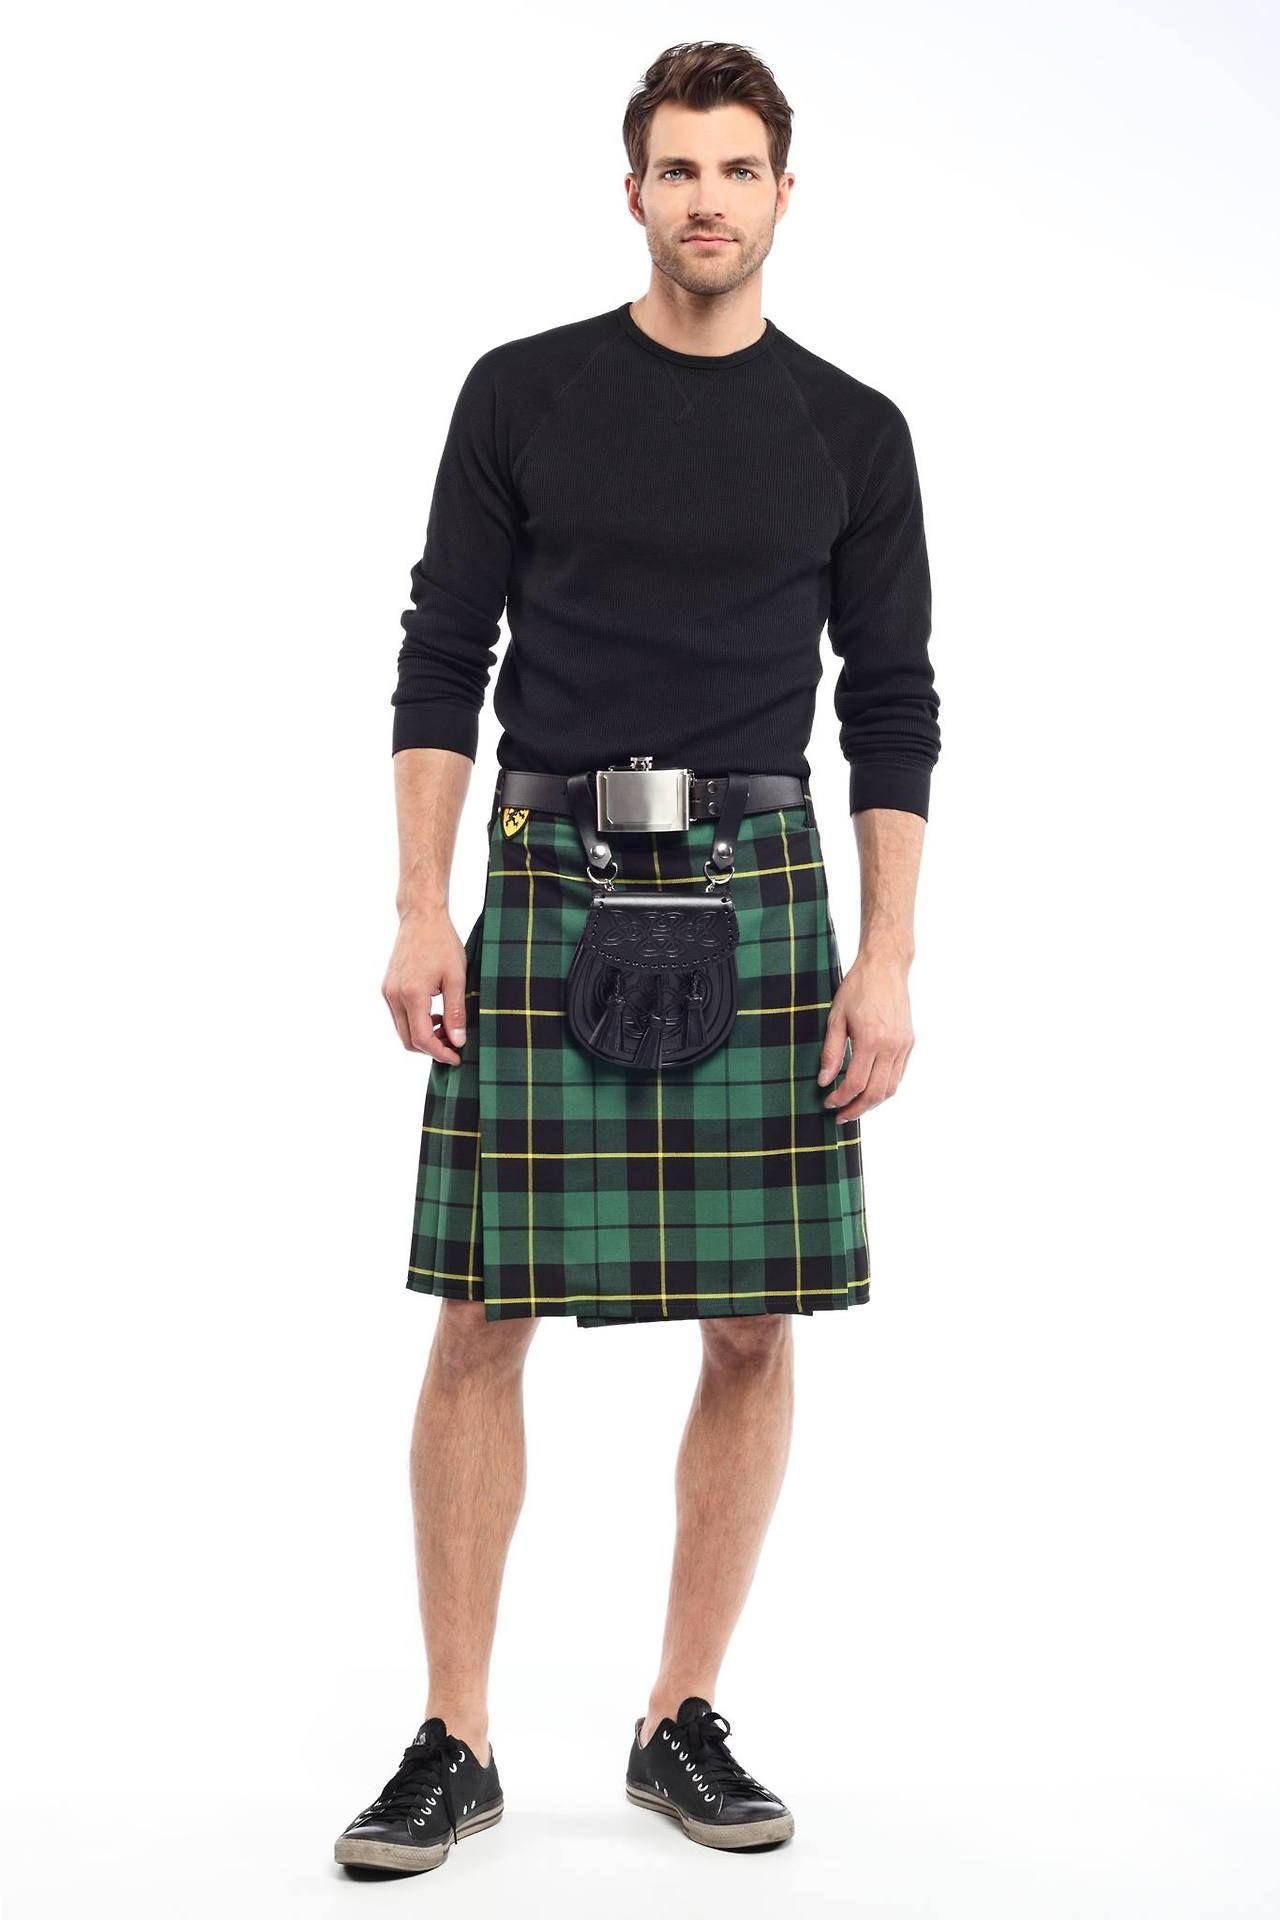 how to wear a kilt mensfashion kilts mens fashion pinterest